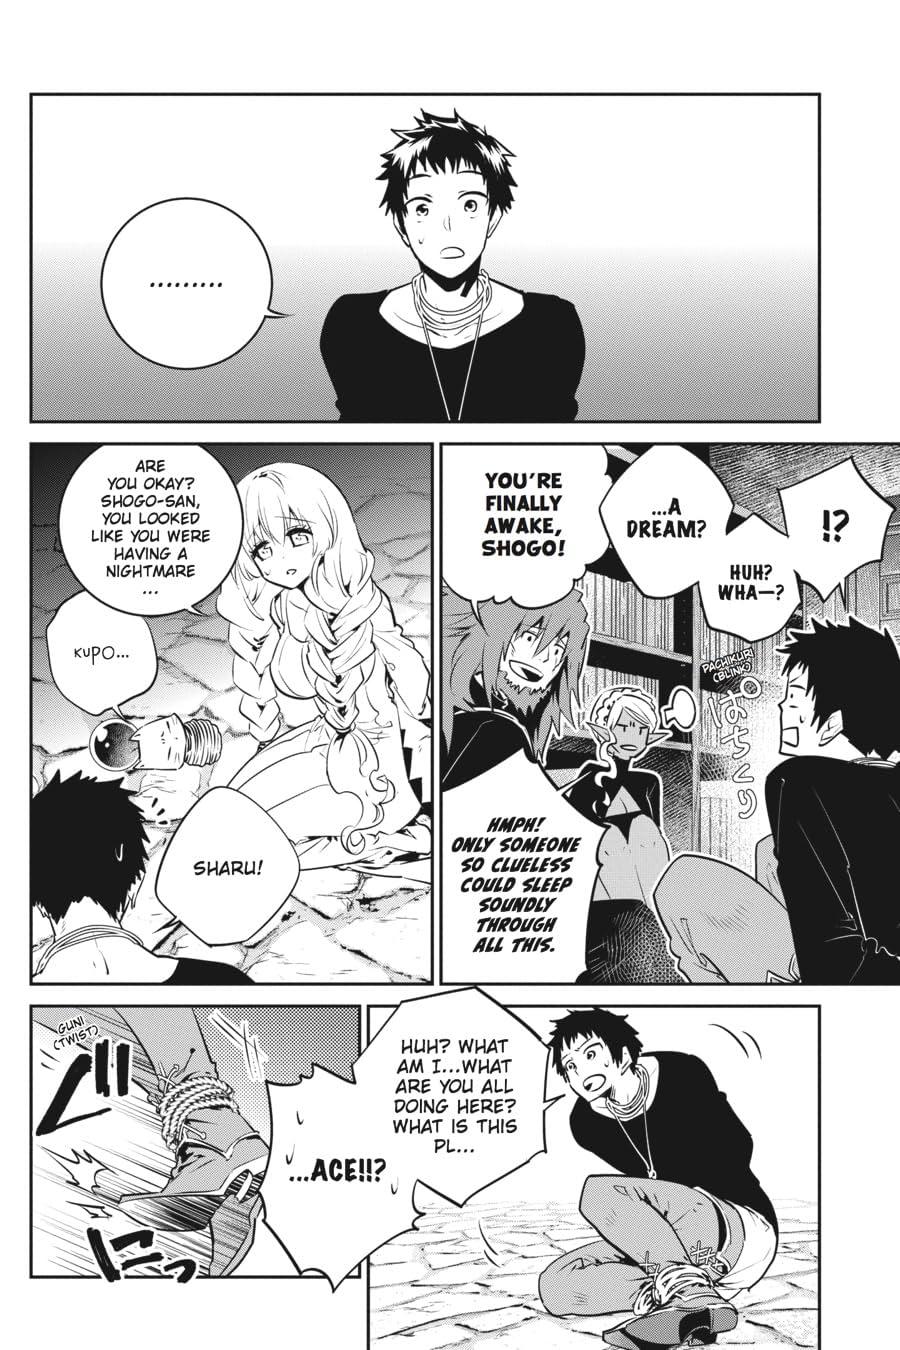 Final Fantasy Lost Stranger #9